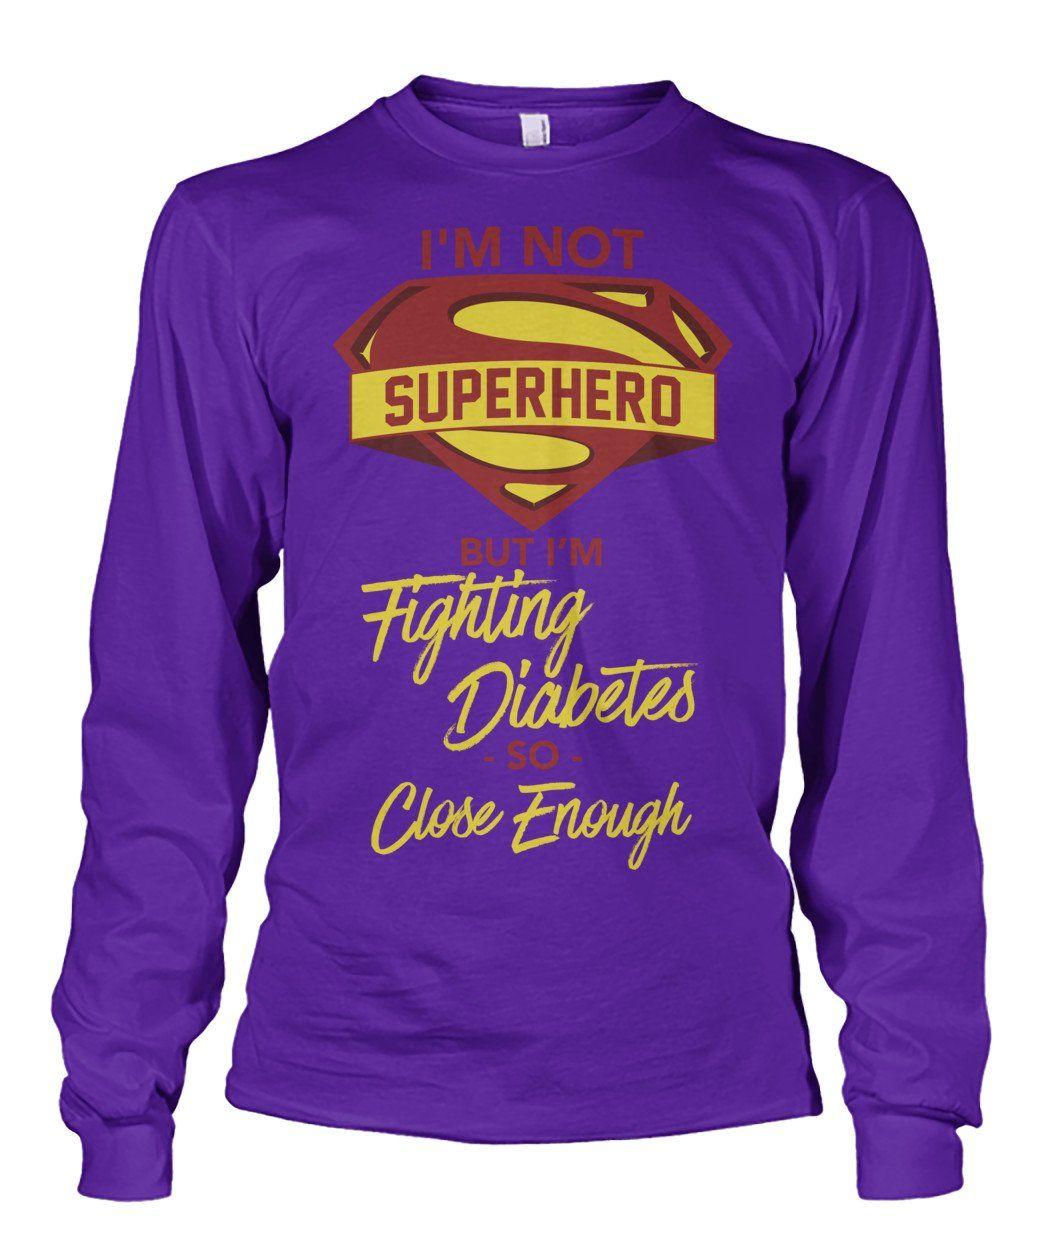 I'm not superhero The best selling Long Sleeve tee, in